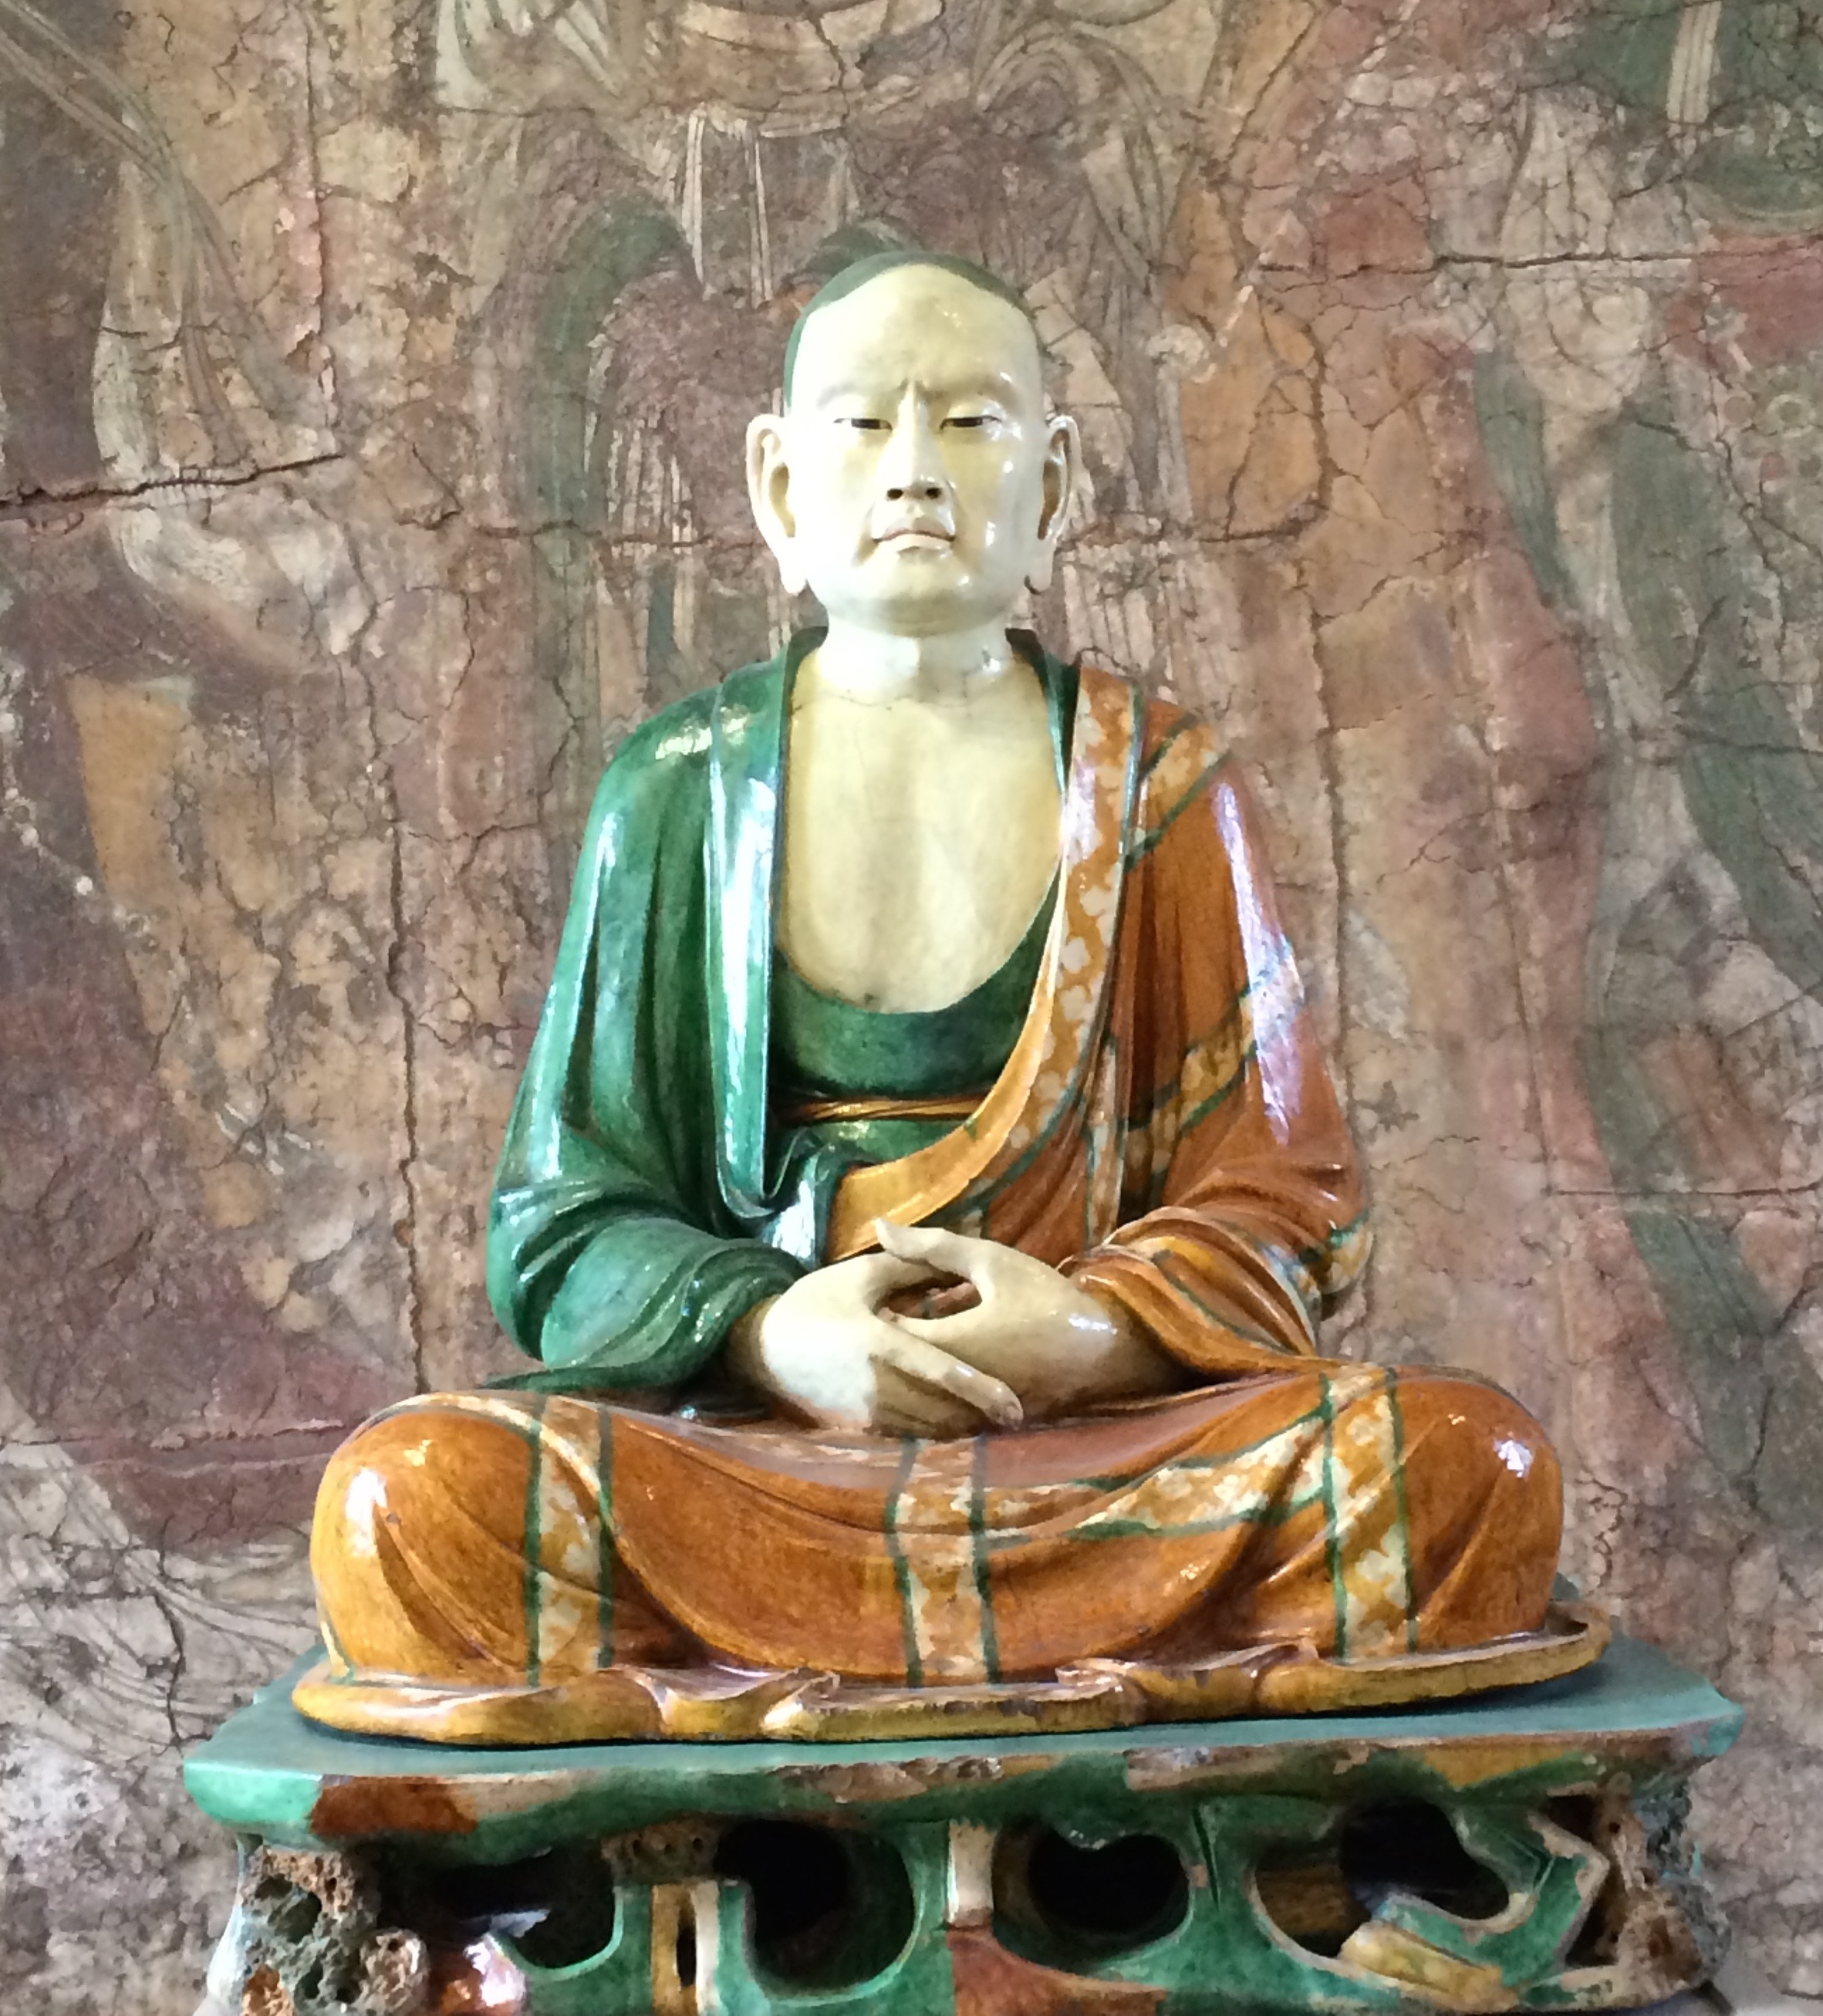 American Buddhists bodhisattvas